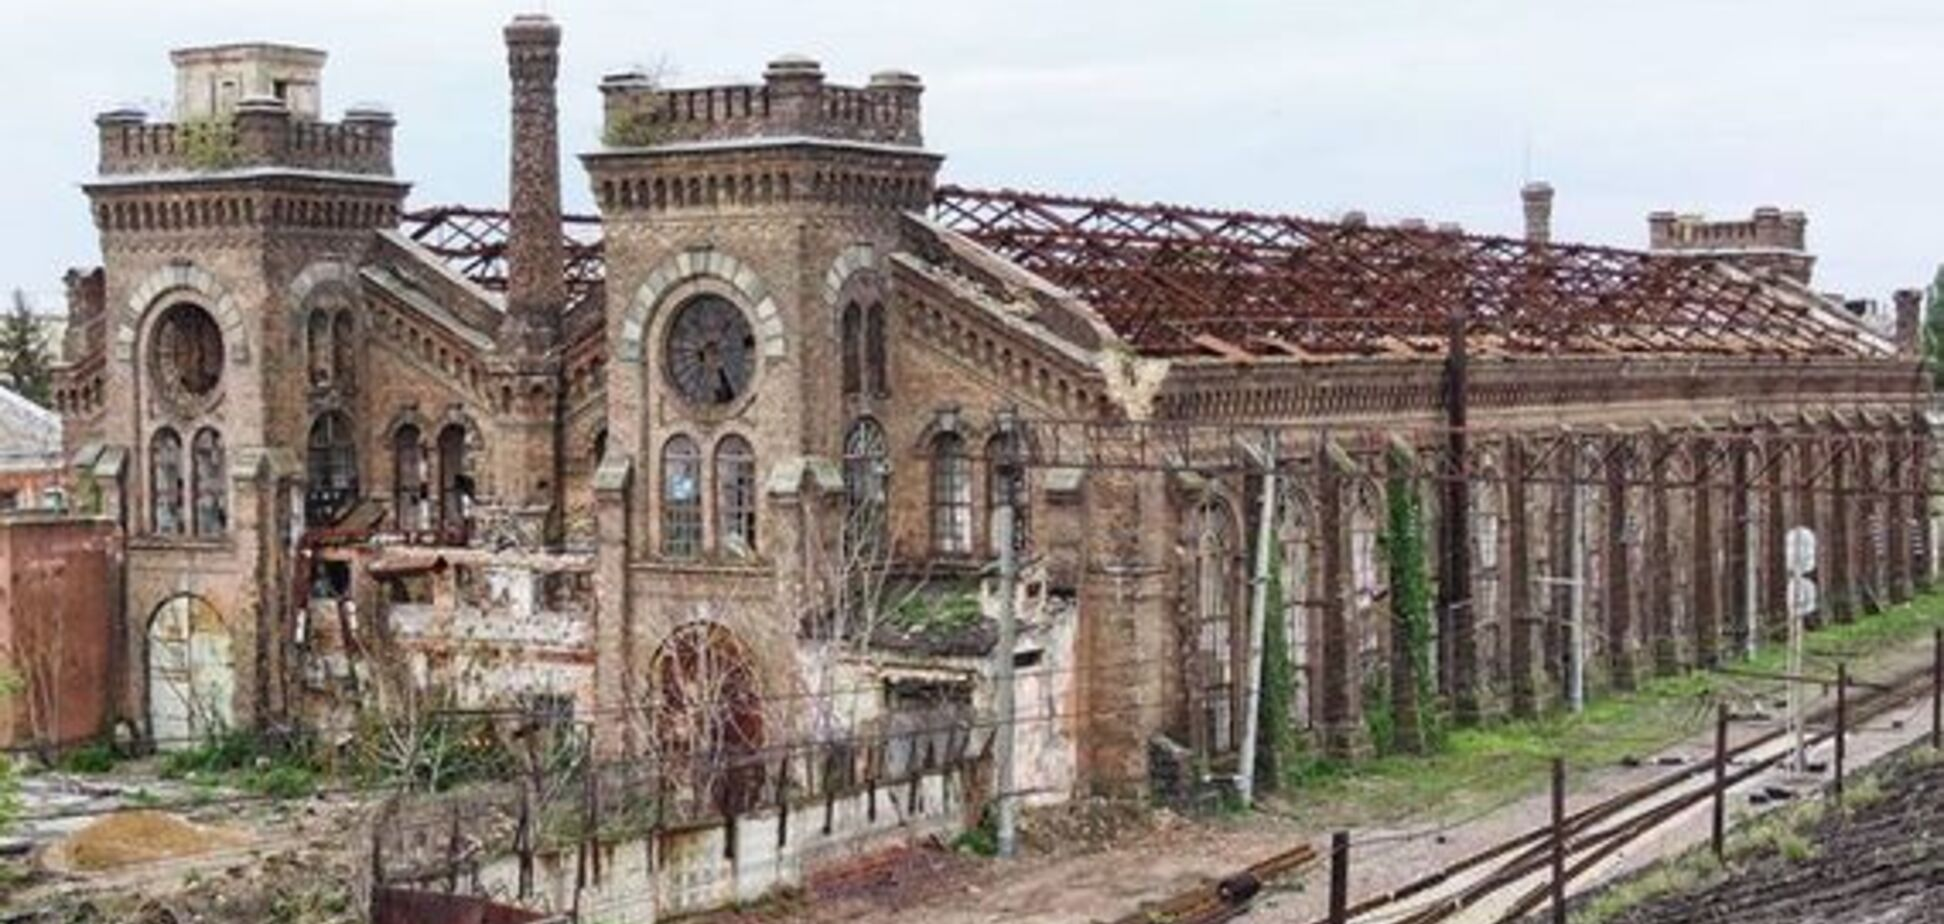 Занедбаний будинок заводу 'Краян'